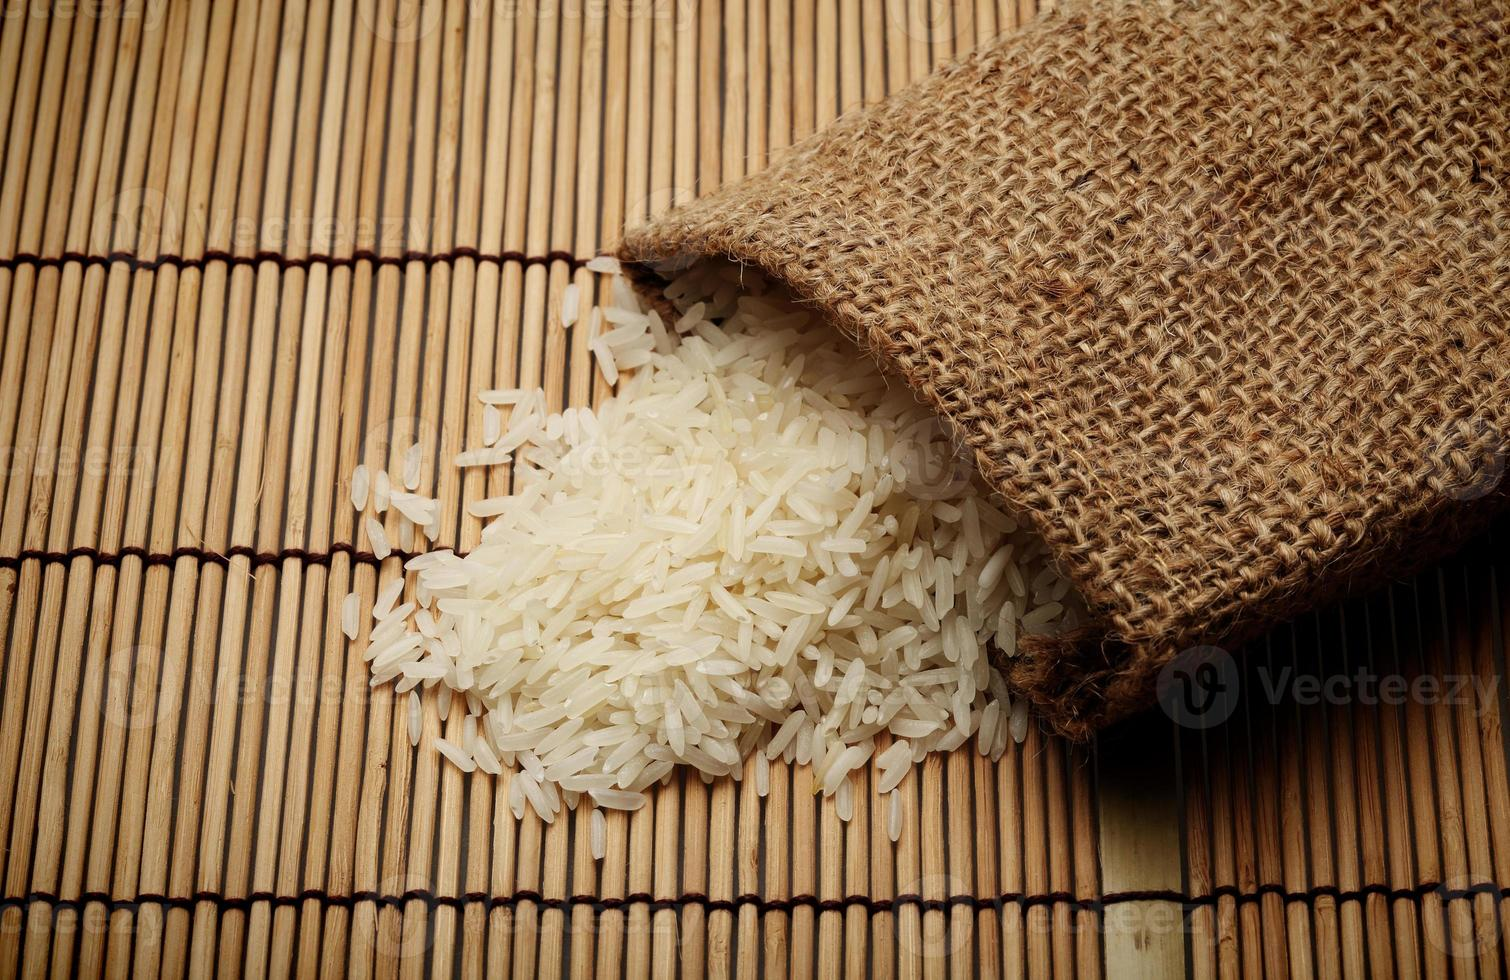 vitt okokt ris i liten säck foto